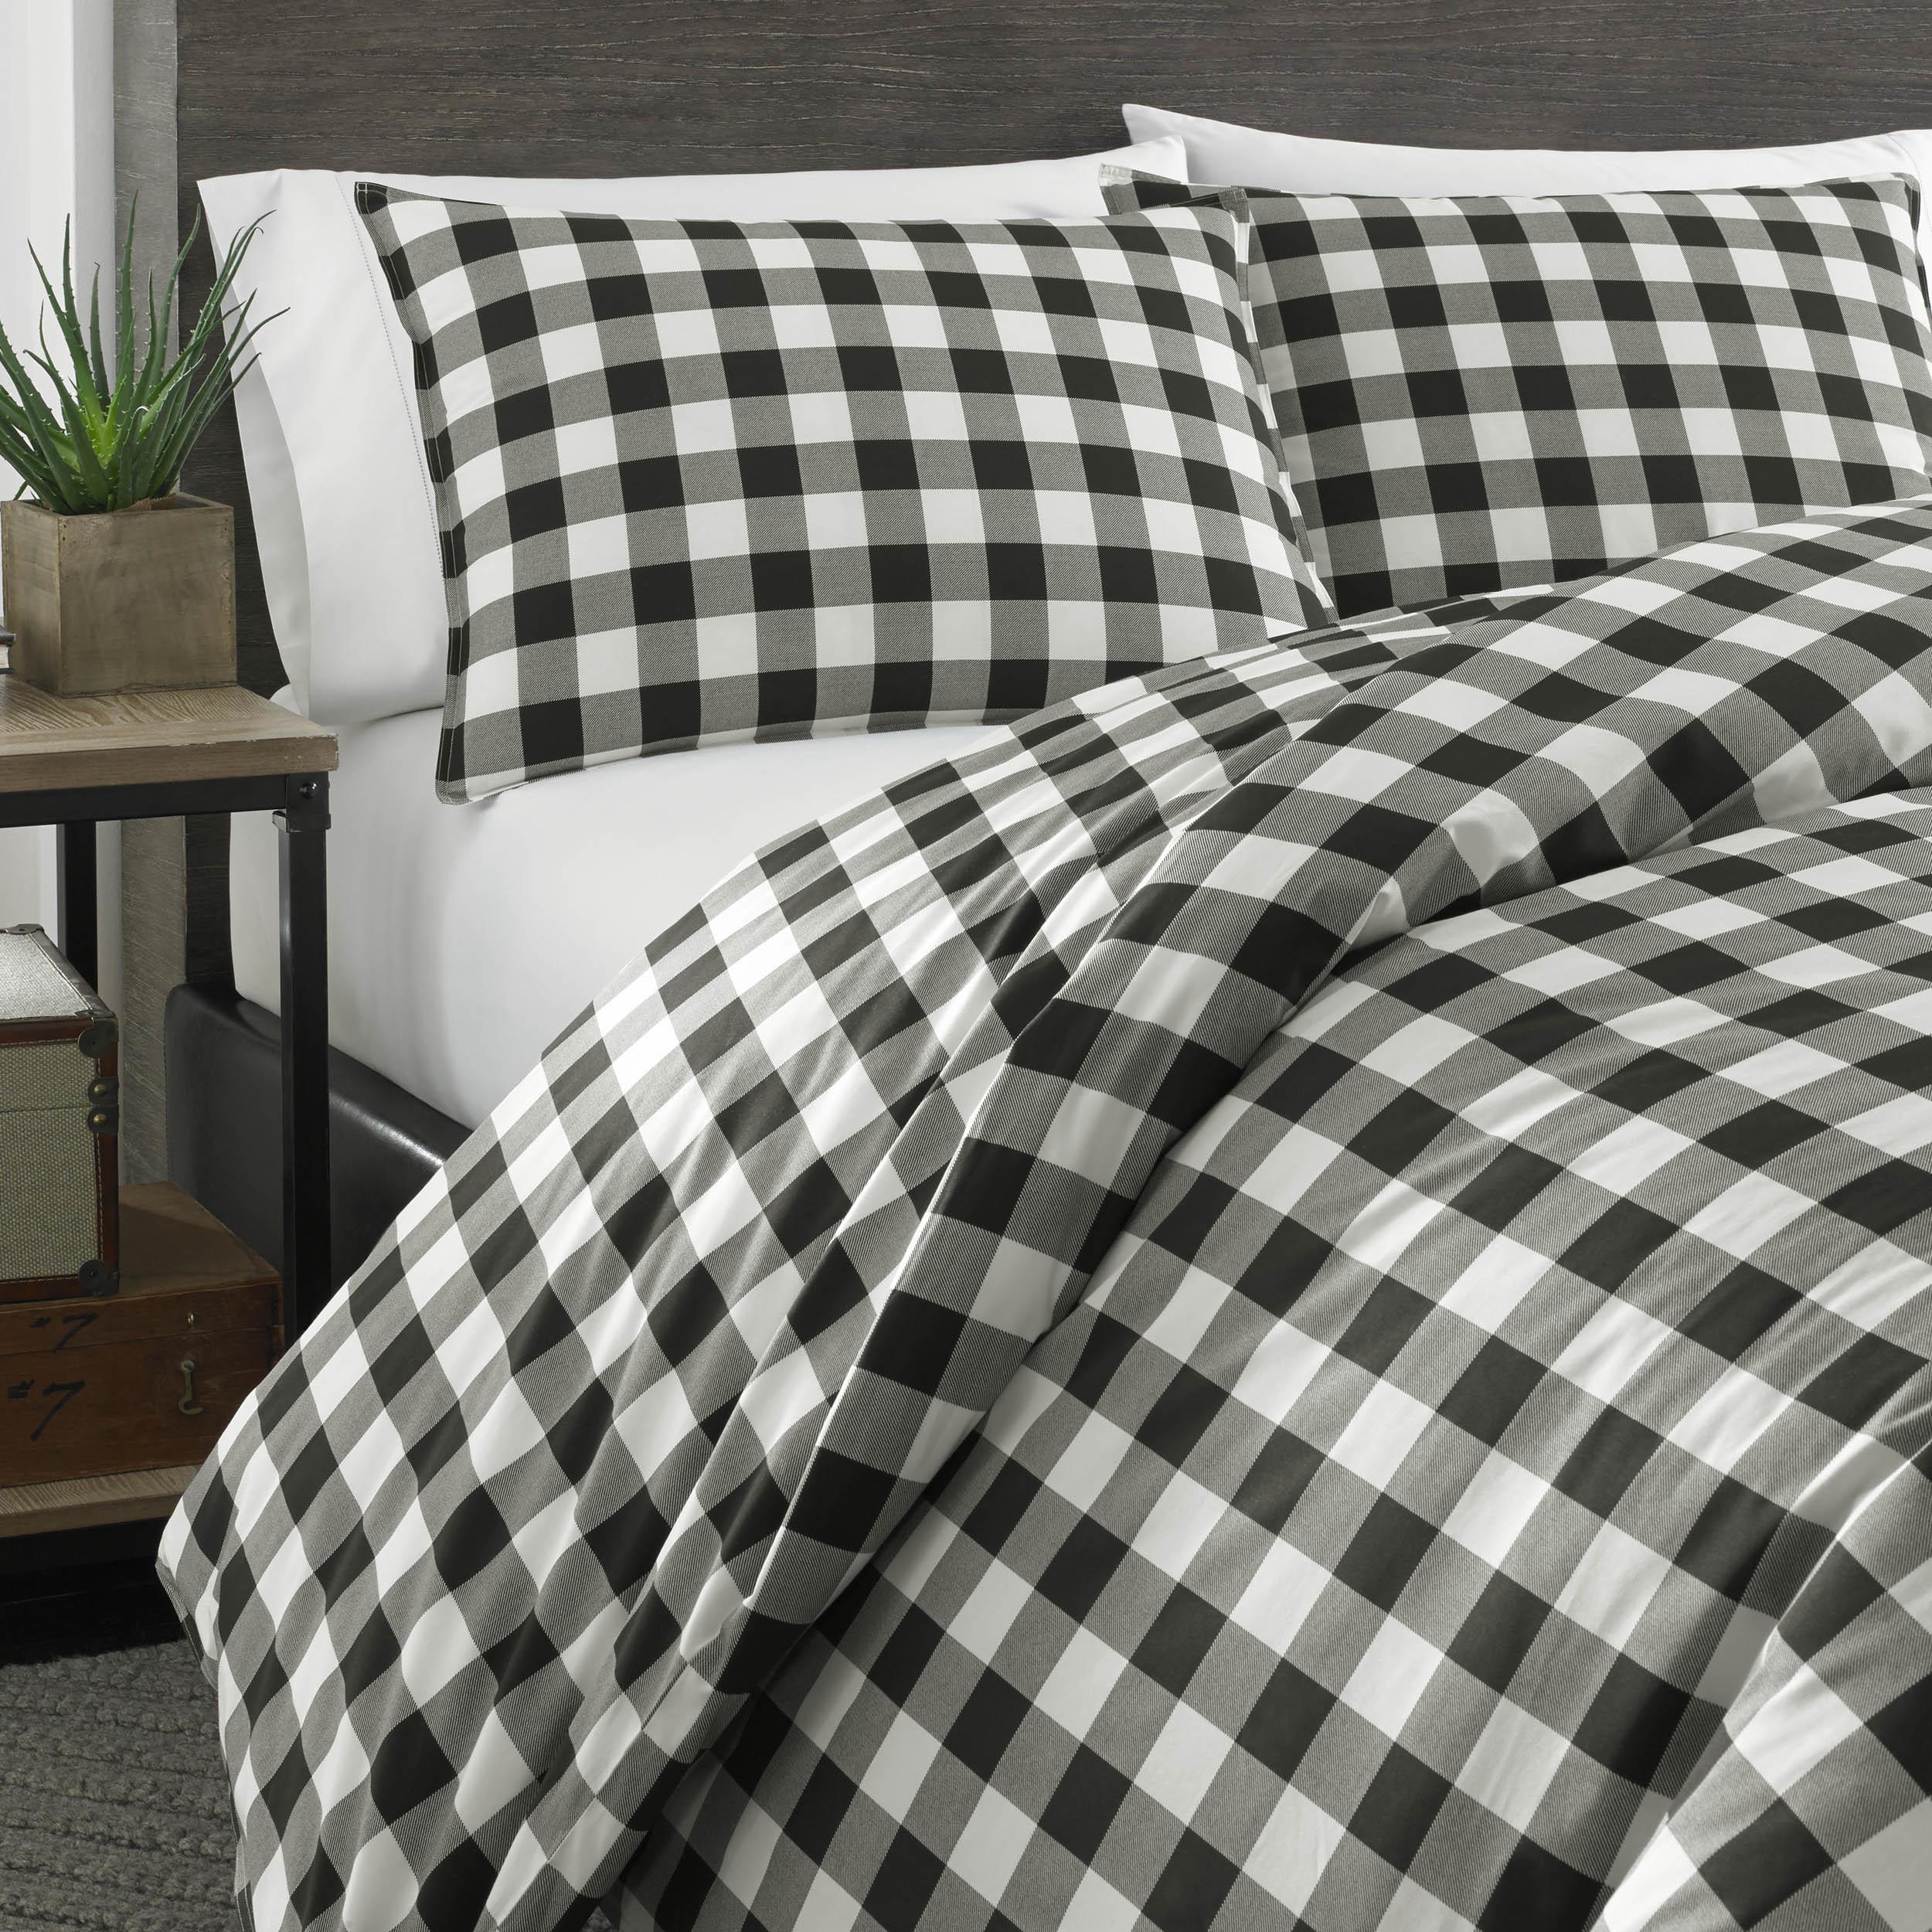 eddie top duvet edgewood bed down plaid watch bedding reversible comforter alternative covers bauer